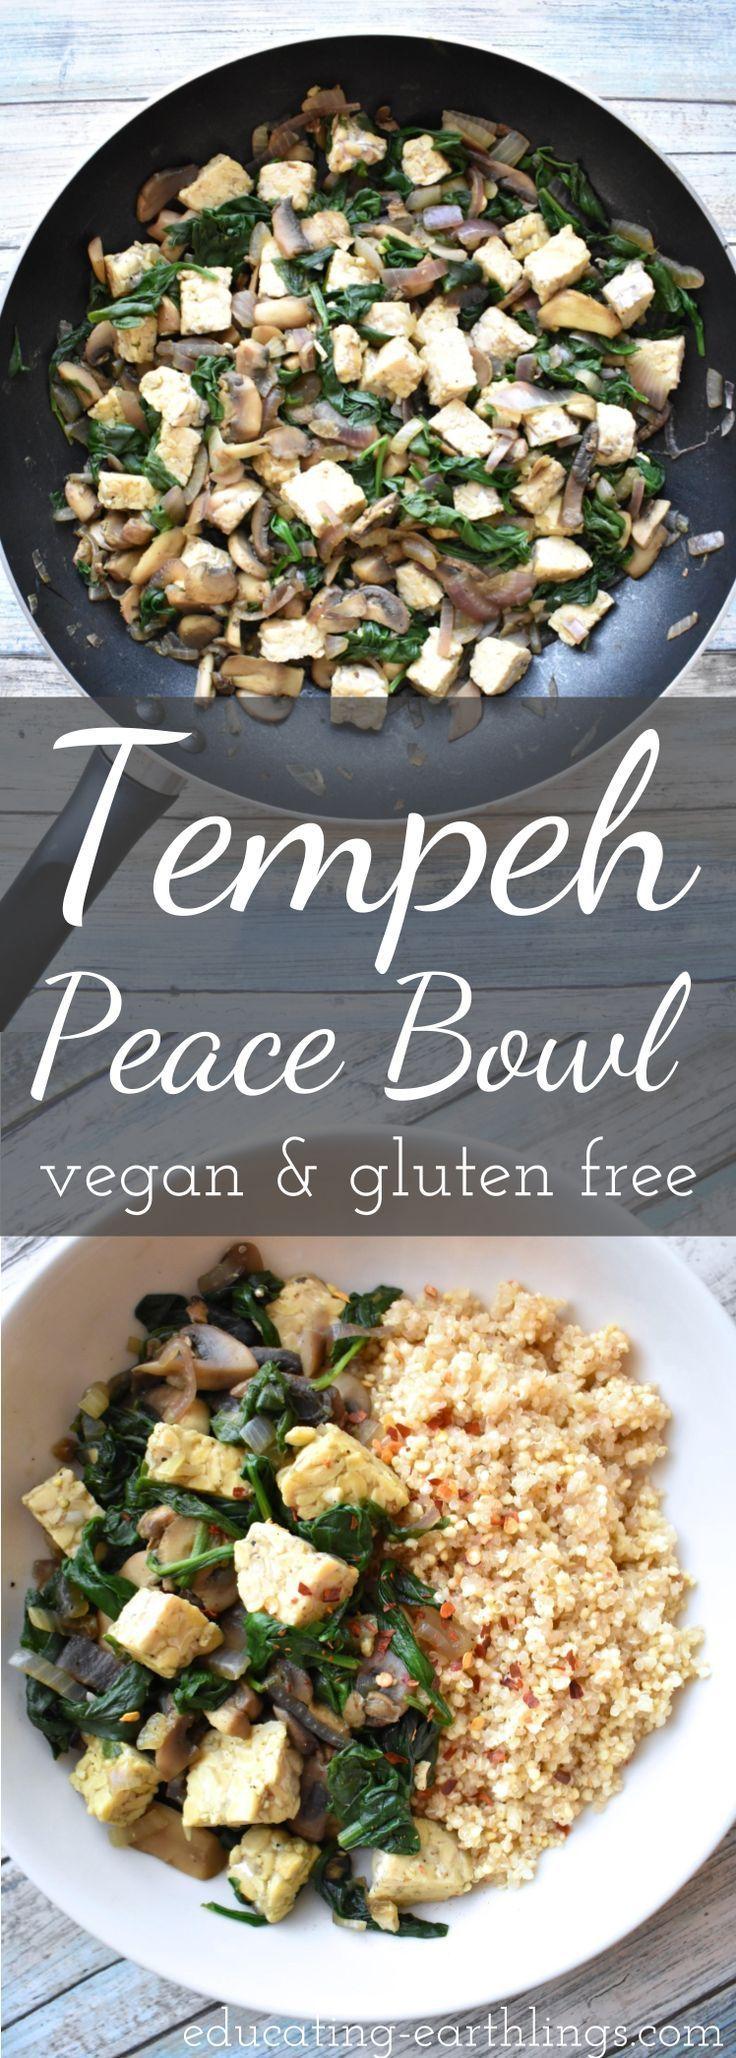 Tempeh Peace Bowl (vegan & gluten free) Benefits of Tempeh, soy protein, plant based protein, vegan meals, vegan recipes, plant based diet, vegan food